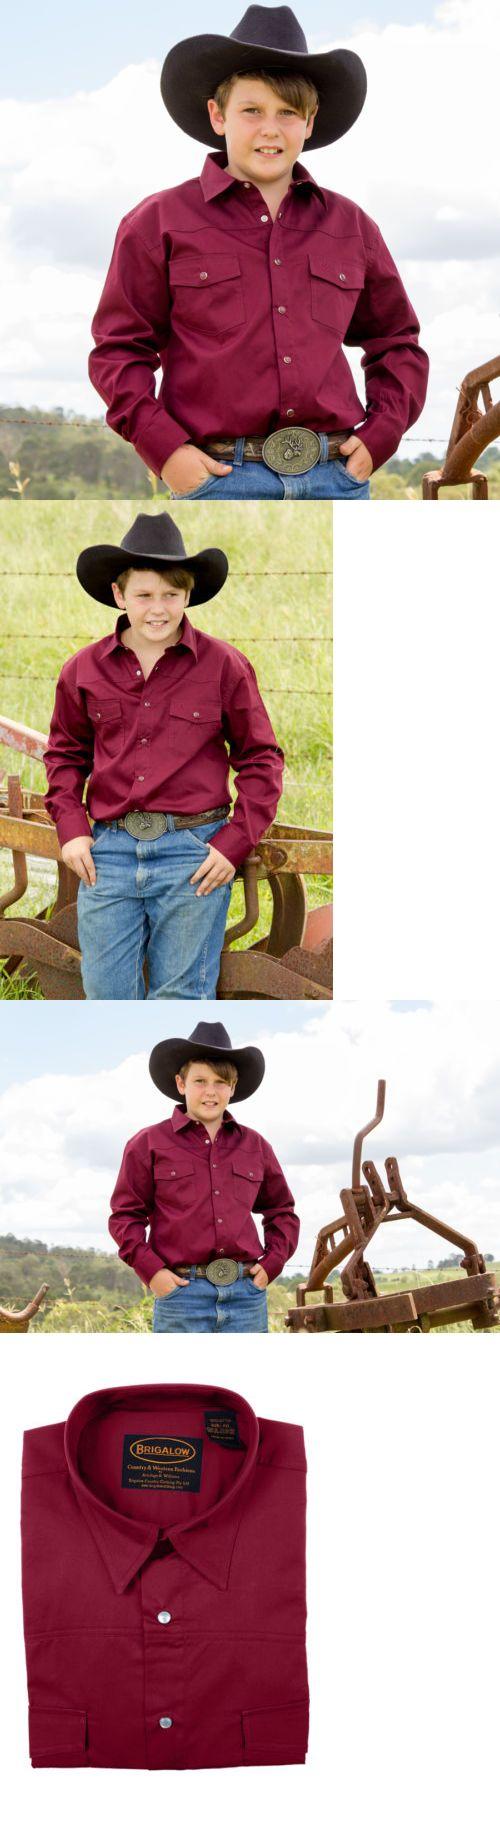 Western Show Shirts 183376: New Boys 100% Cotton Maroon Dress Shirt - 8056S Boys Shirtbrigalow -> BUY IT NOW ONLY: $69.95 on eBay!